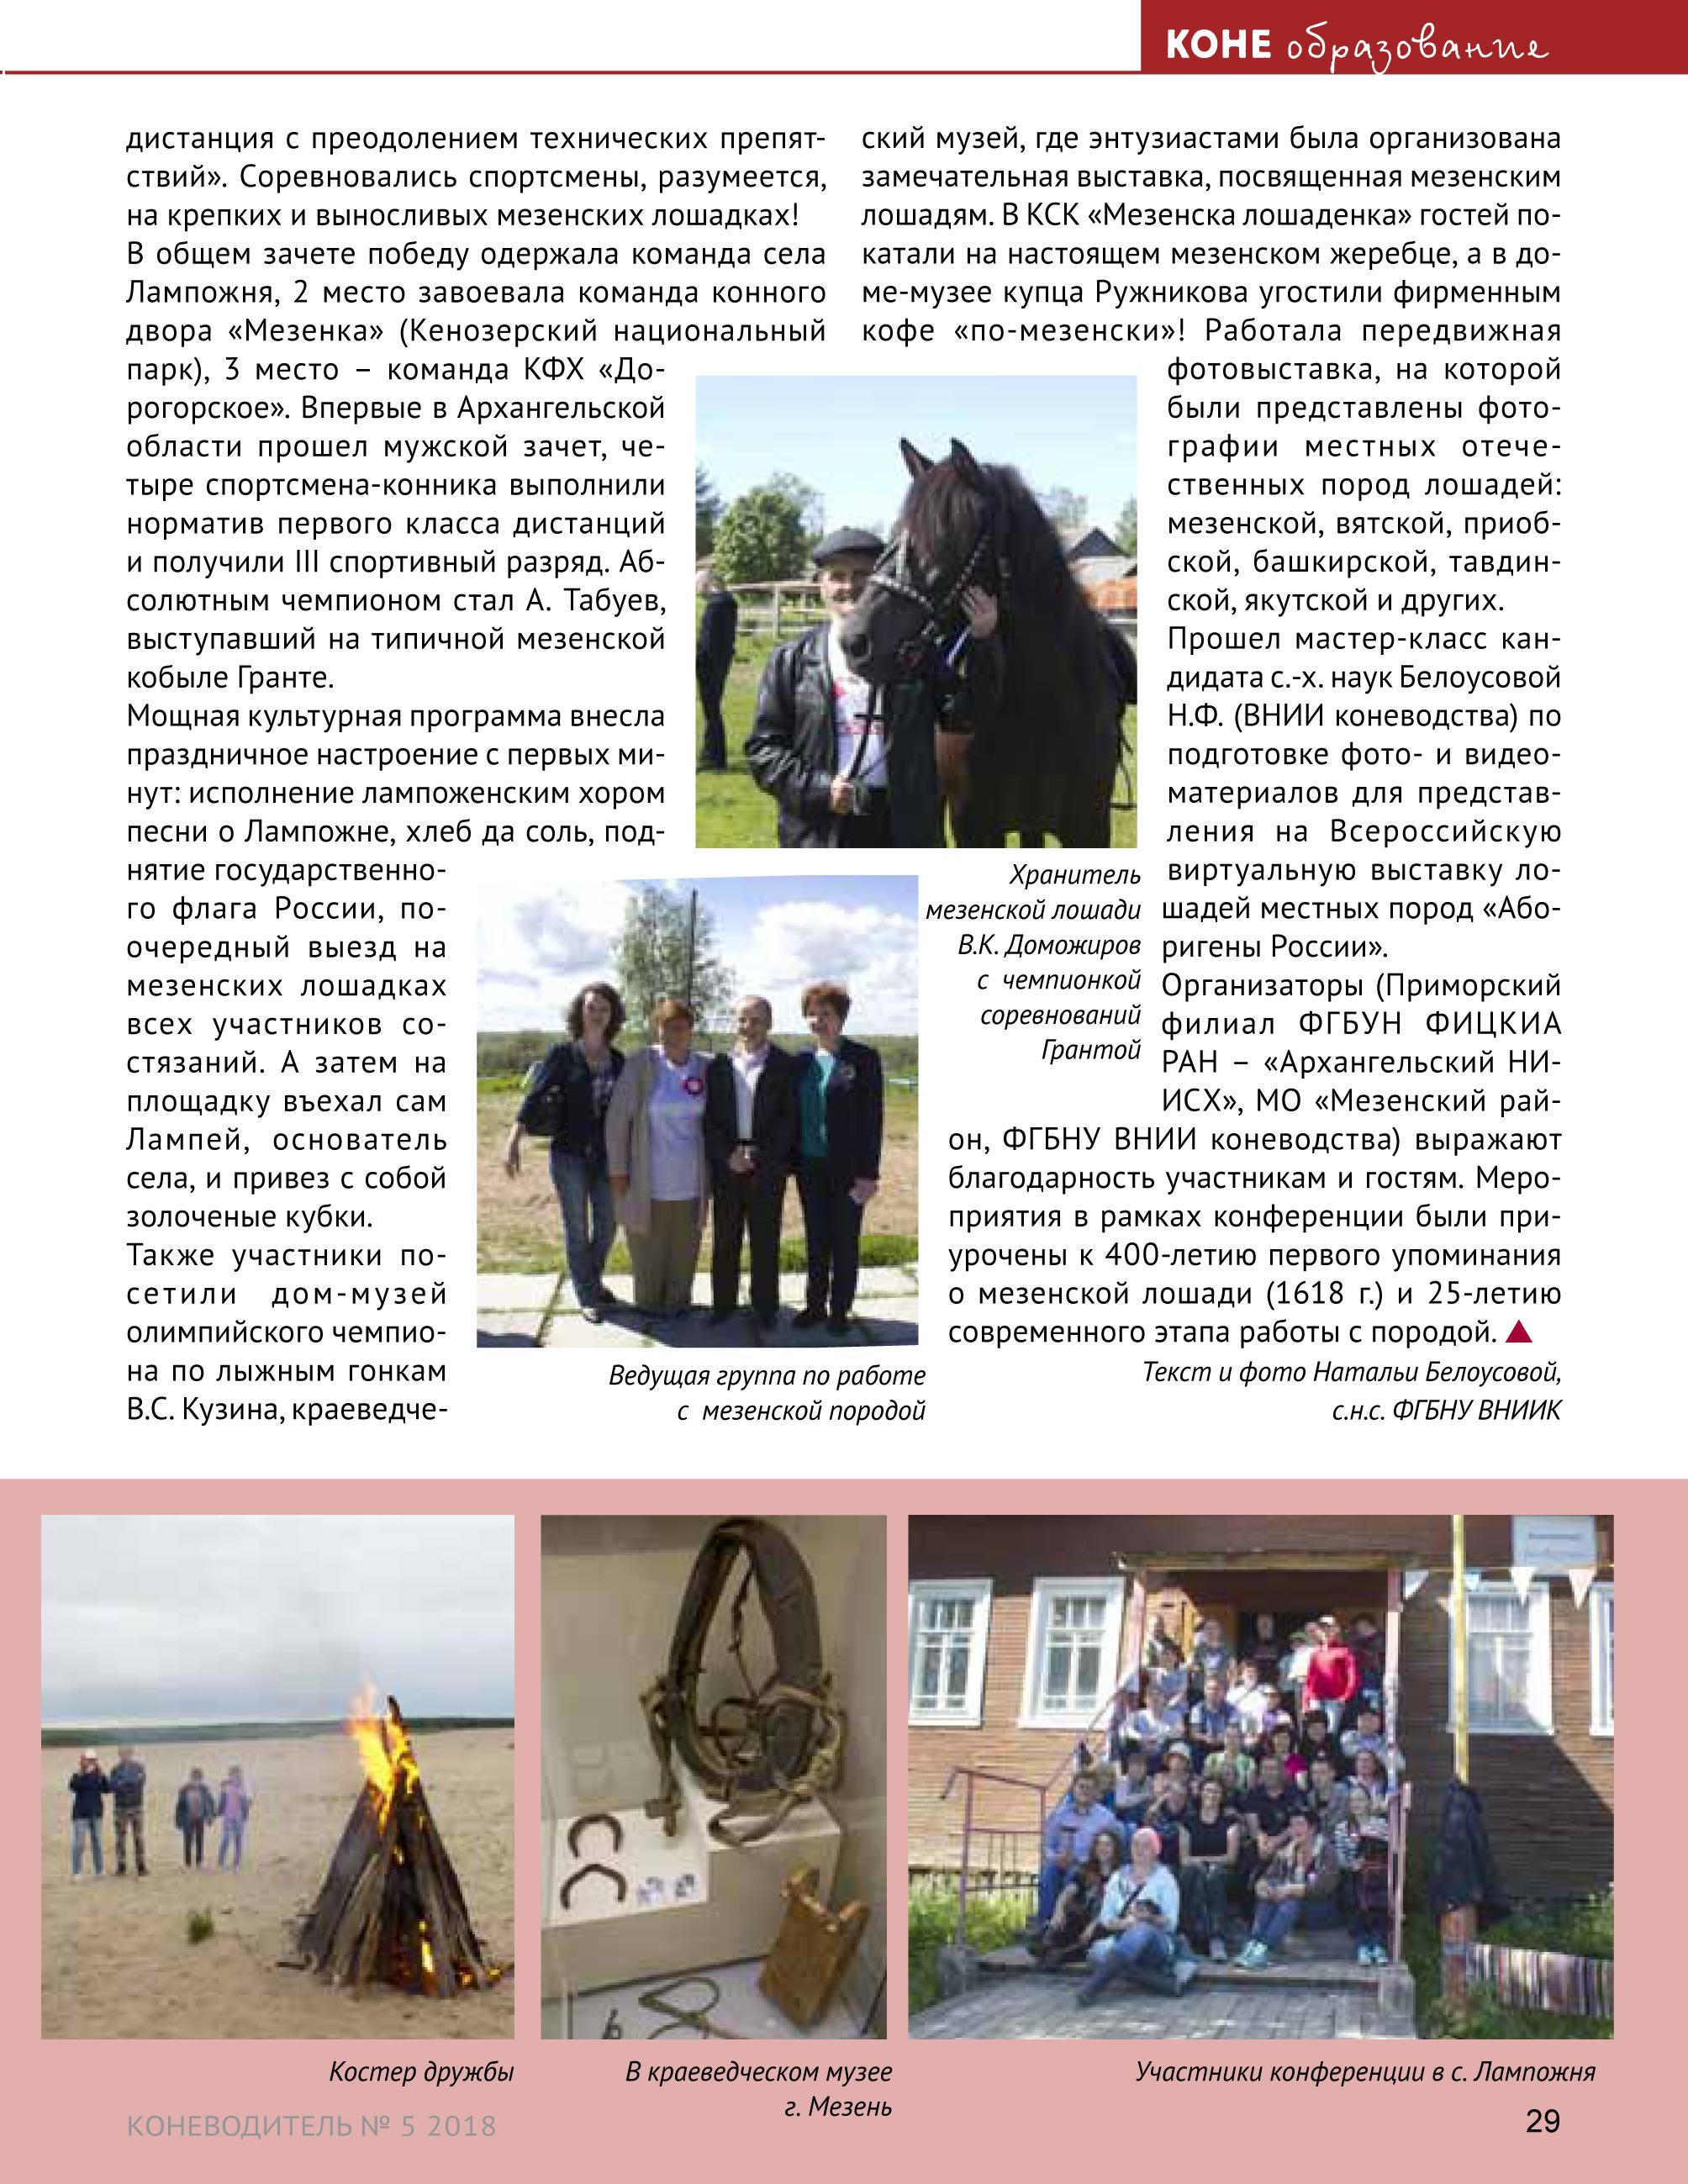 Book 5 2018 ДЛЯ САЙТА-29